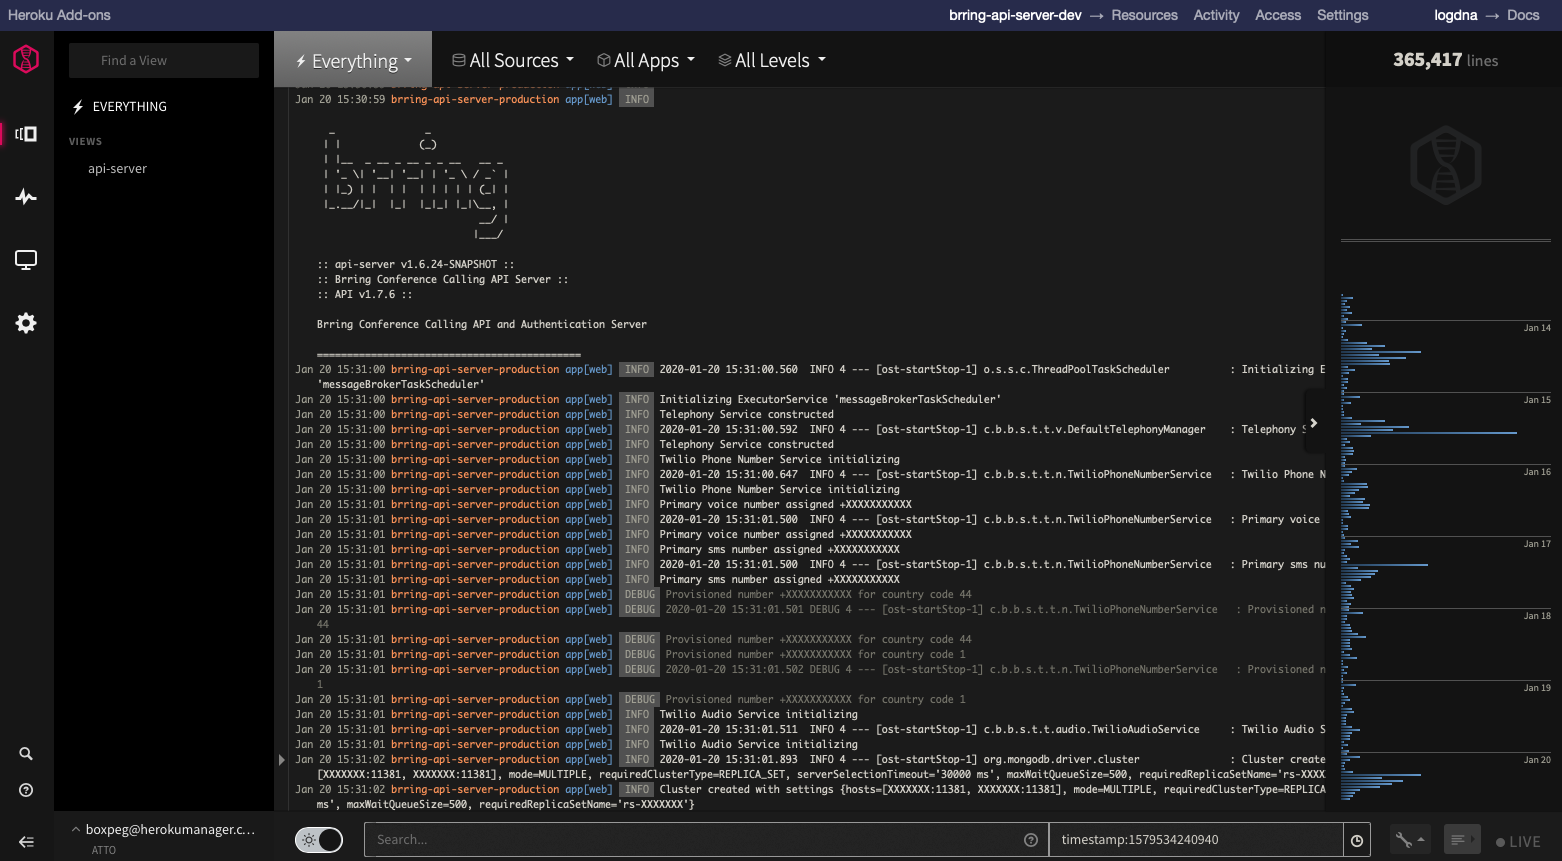 LogDNA Dashboard Accessed From Heroku Dashboard